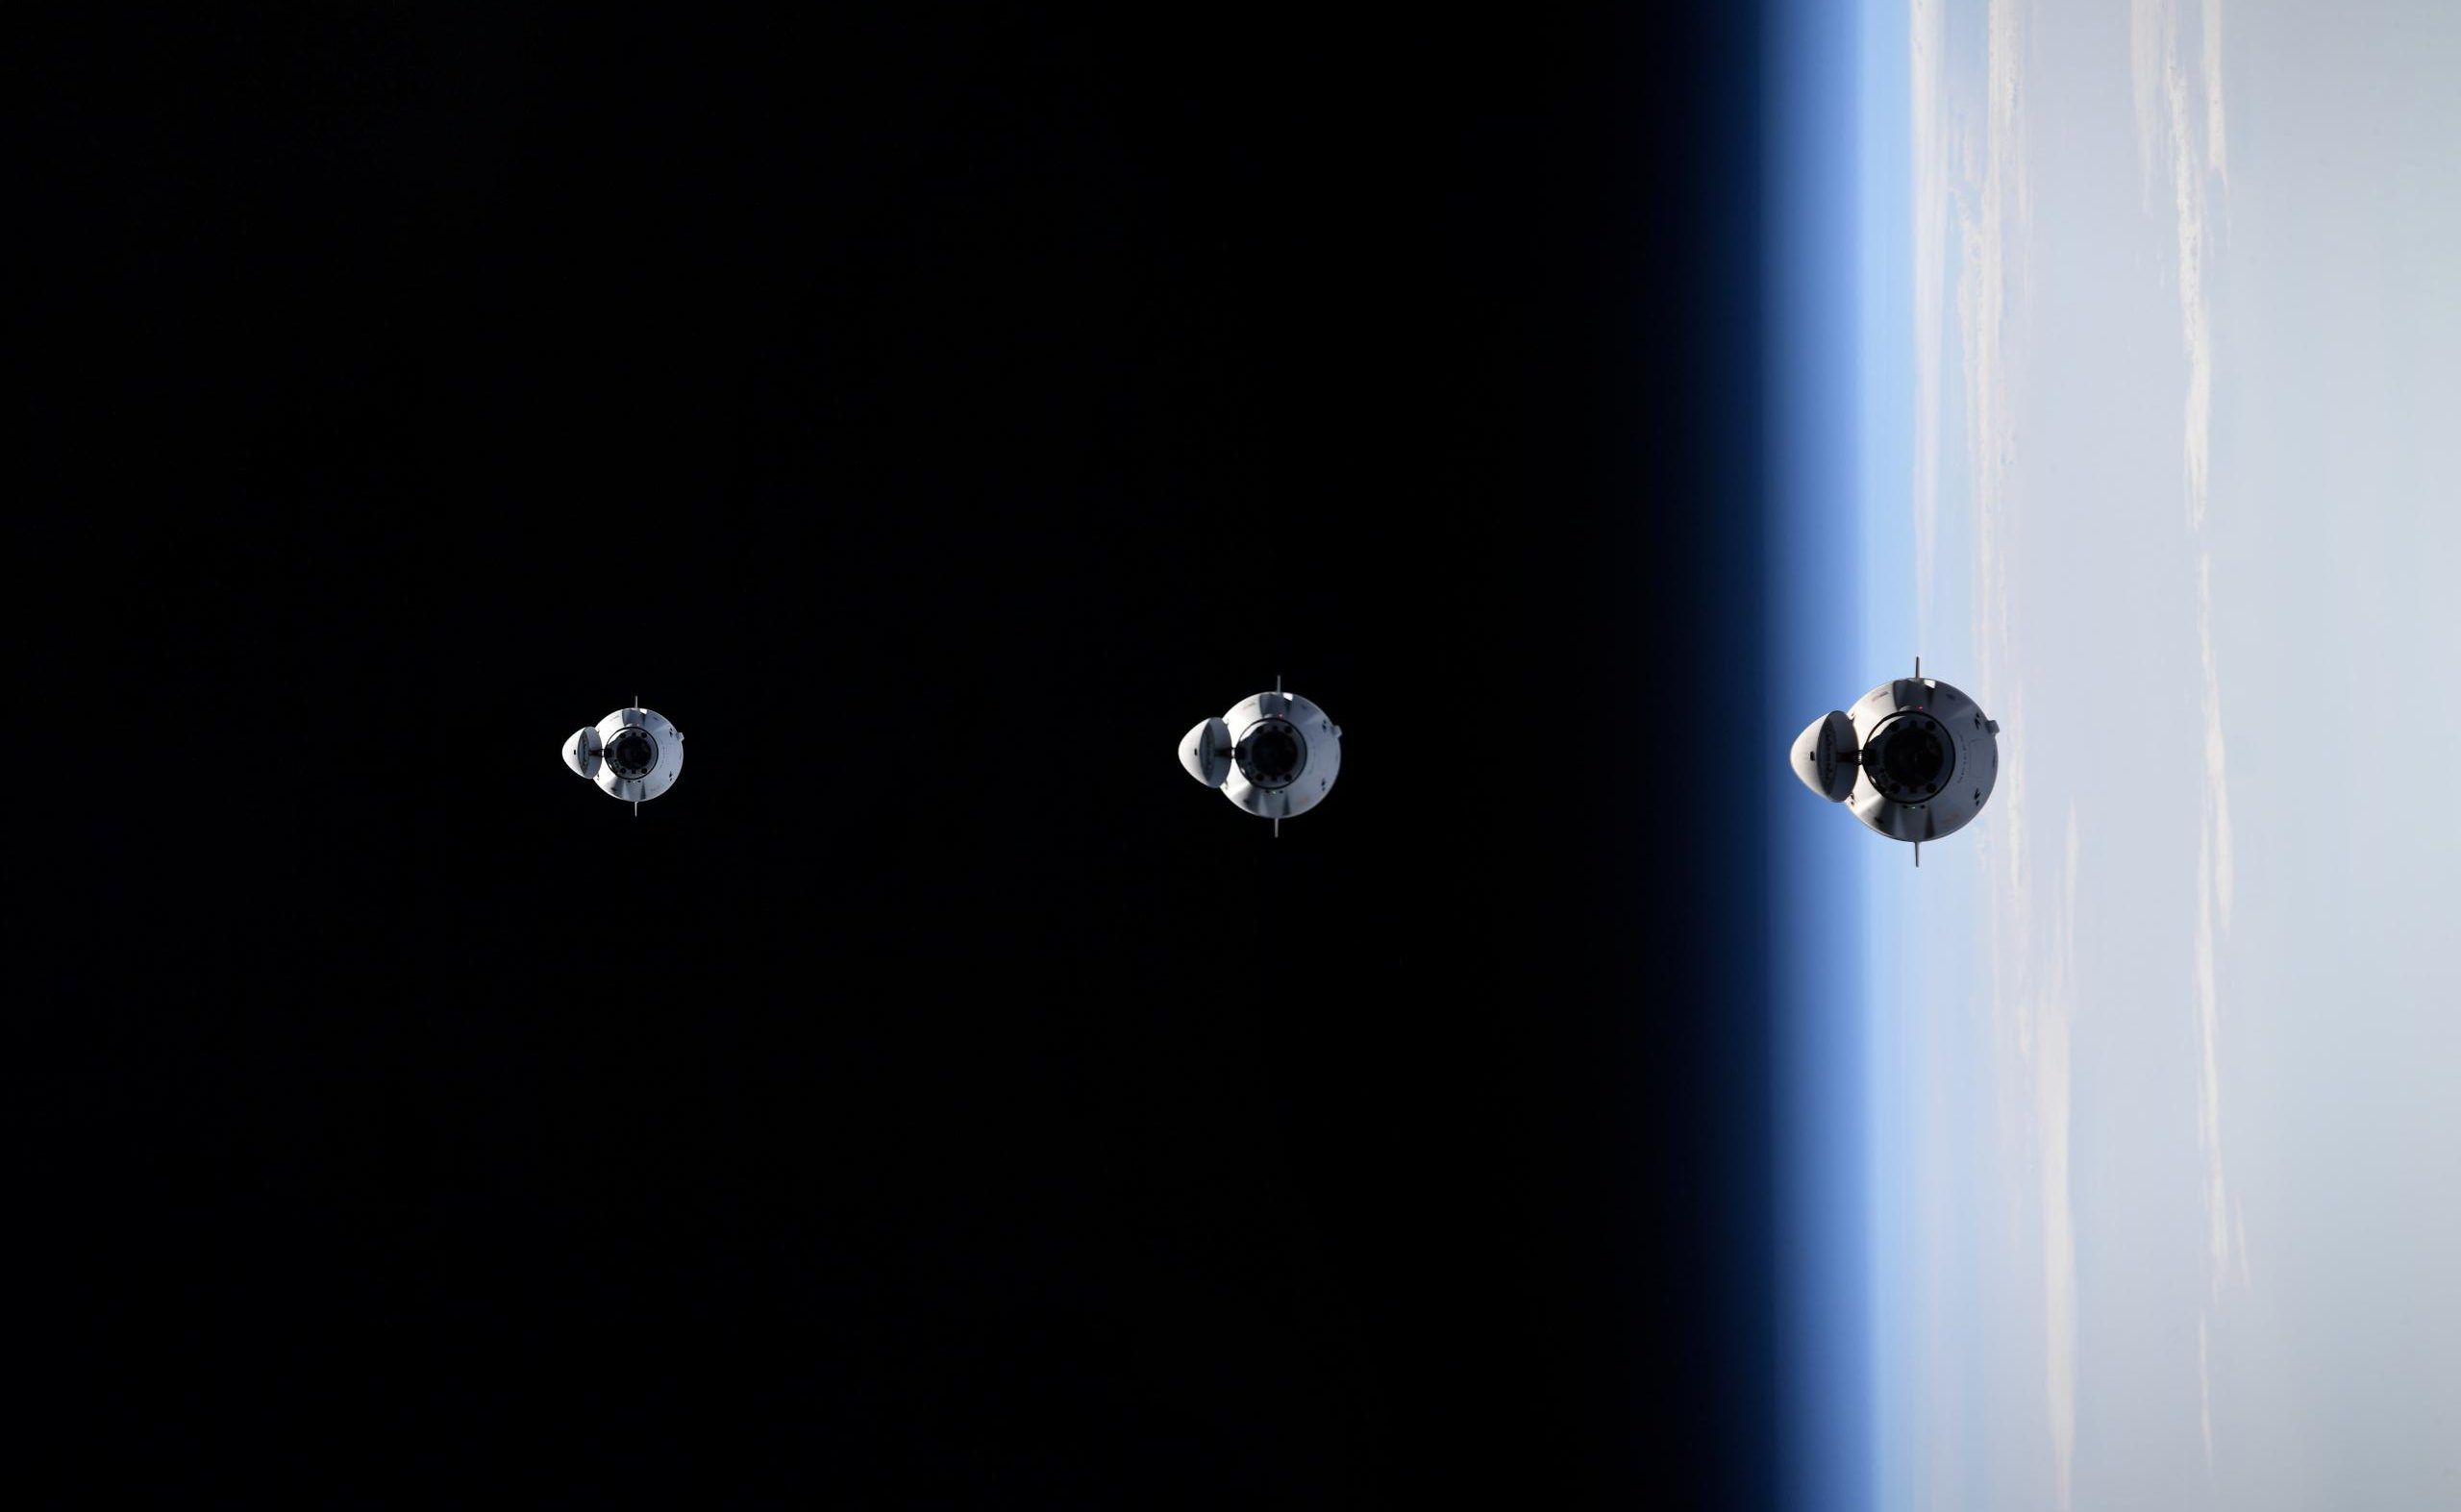 CRS-22 Cargo Dragon C209 ISS rendezvous 060521 (Thomas Pesquet – ESA) panel 1 – Copy (c)